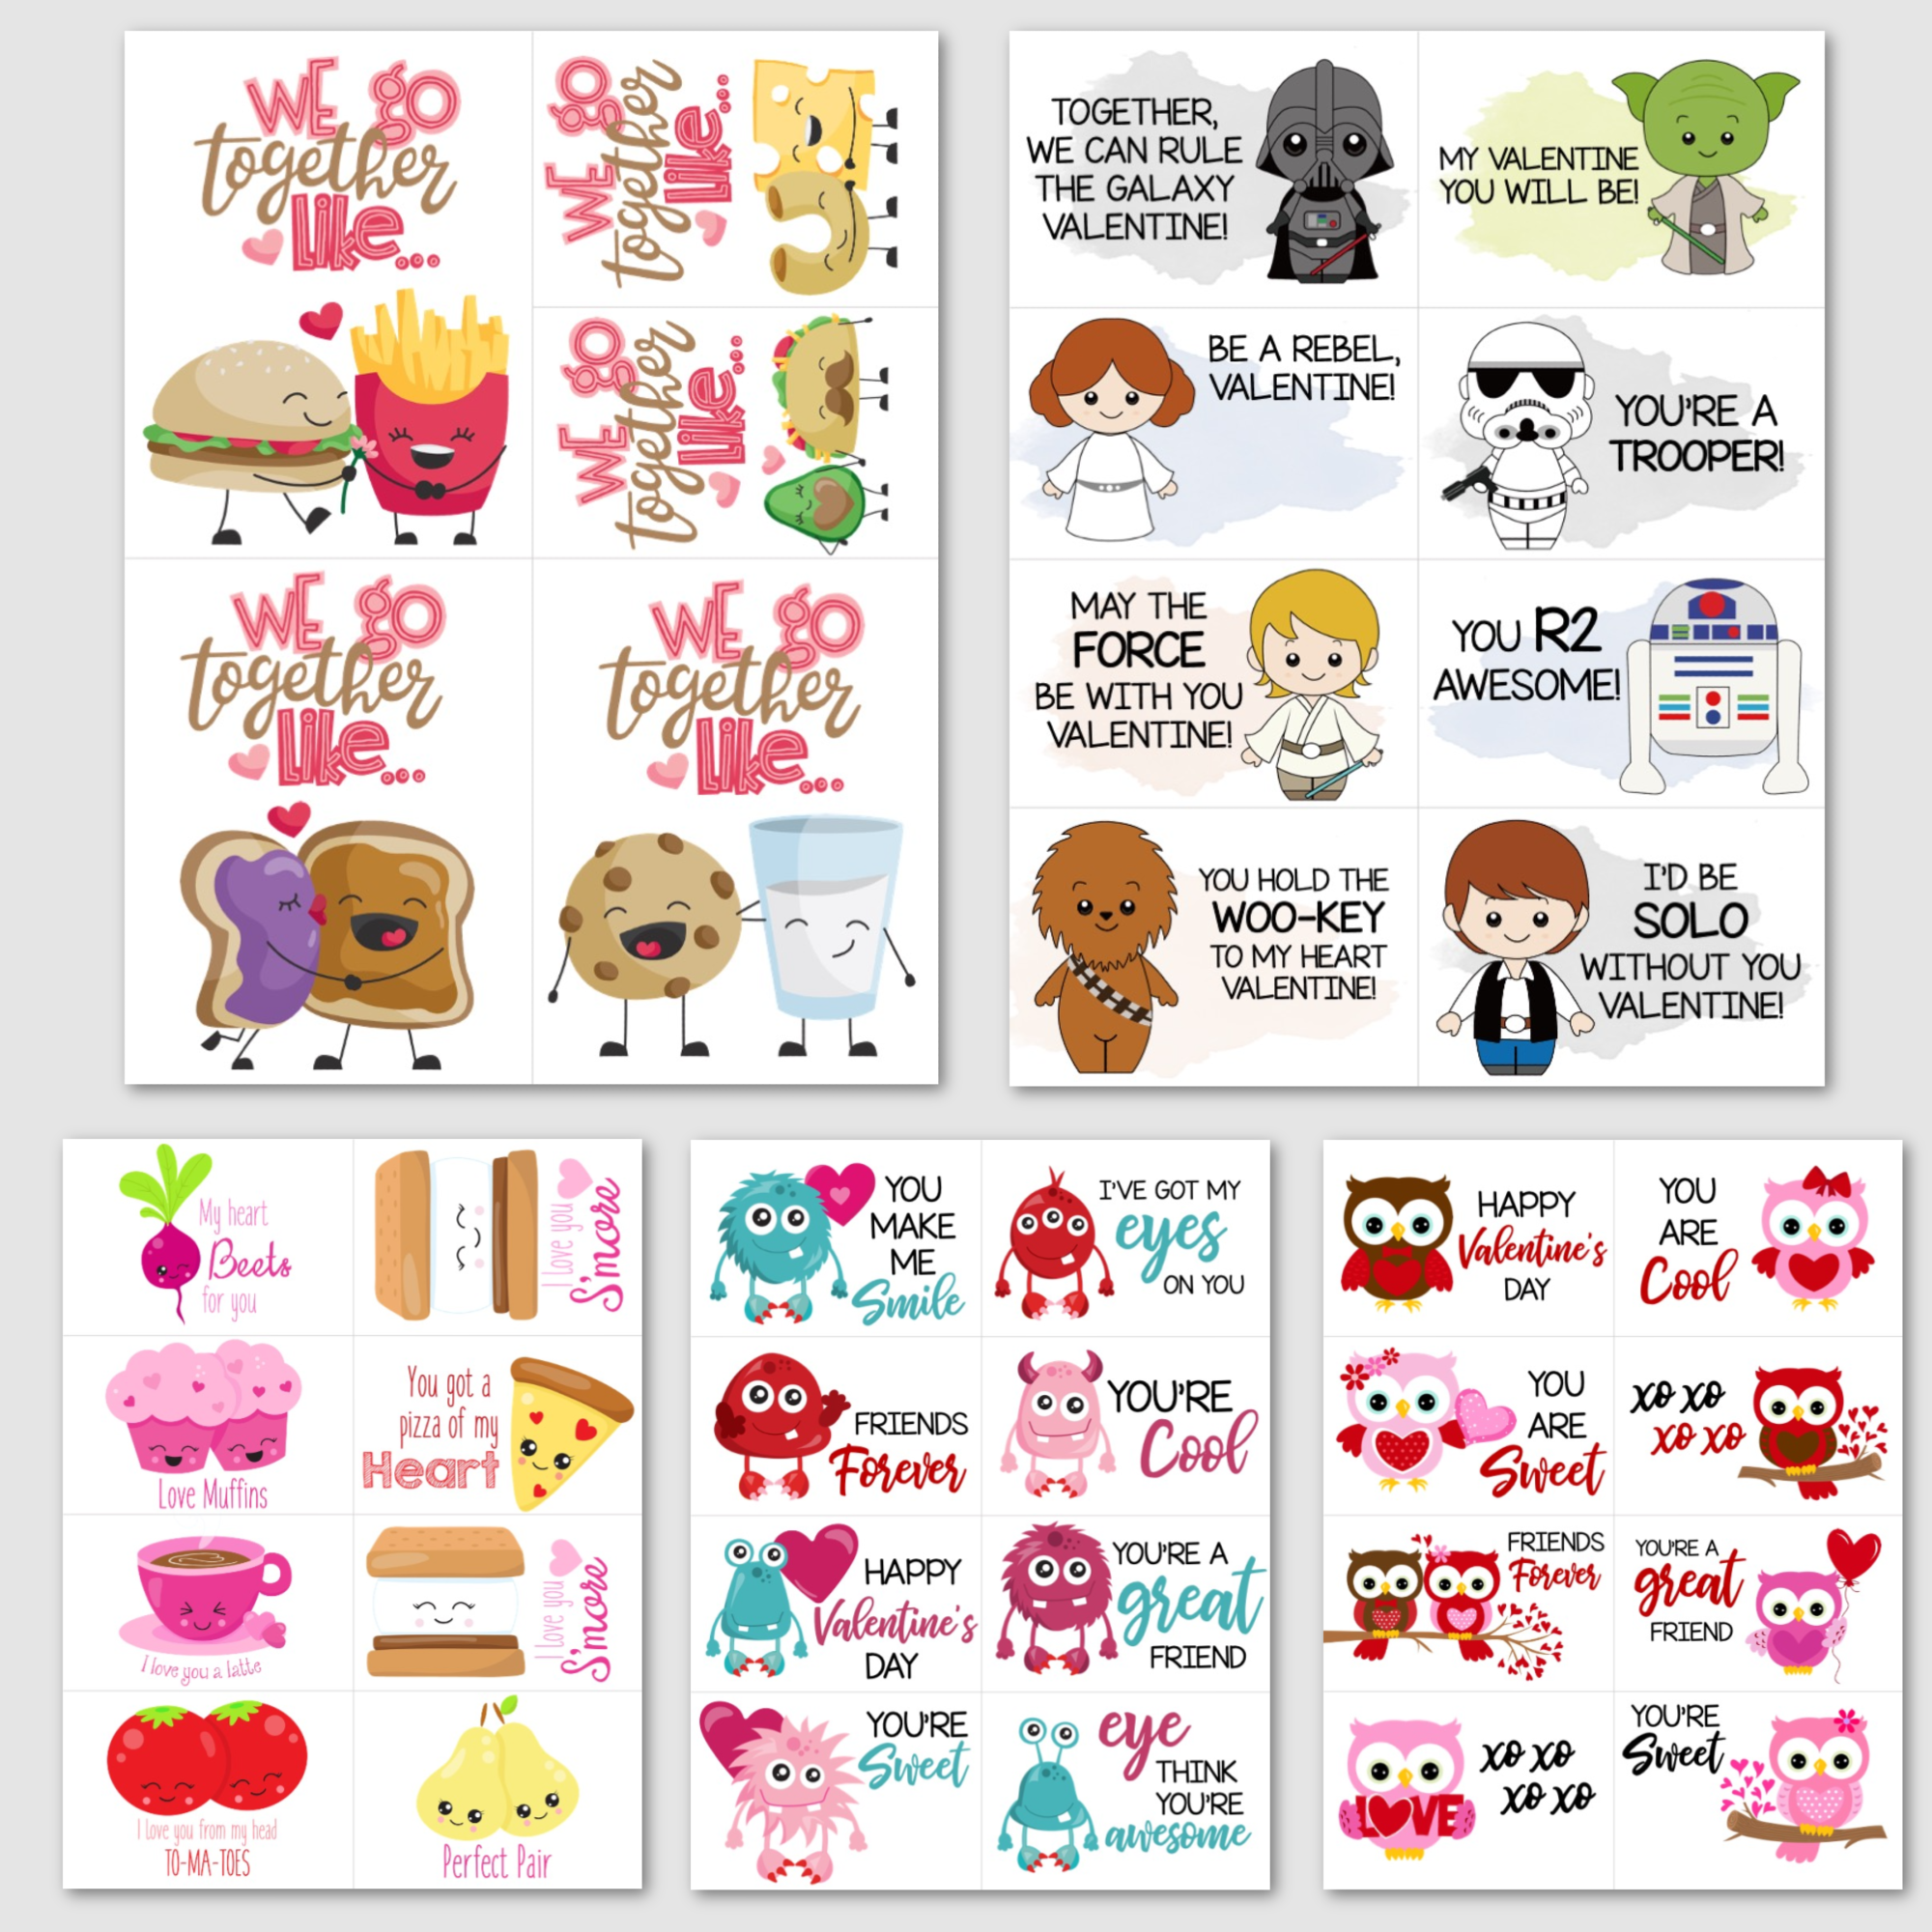 Valentine's Day Fun Printable Cards - 5 Designs